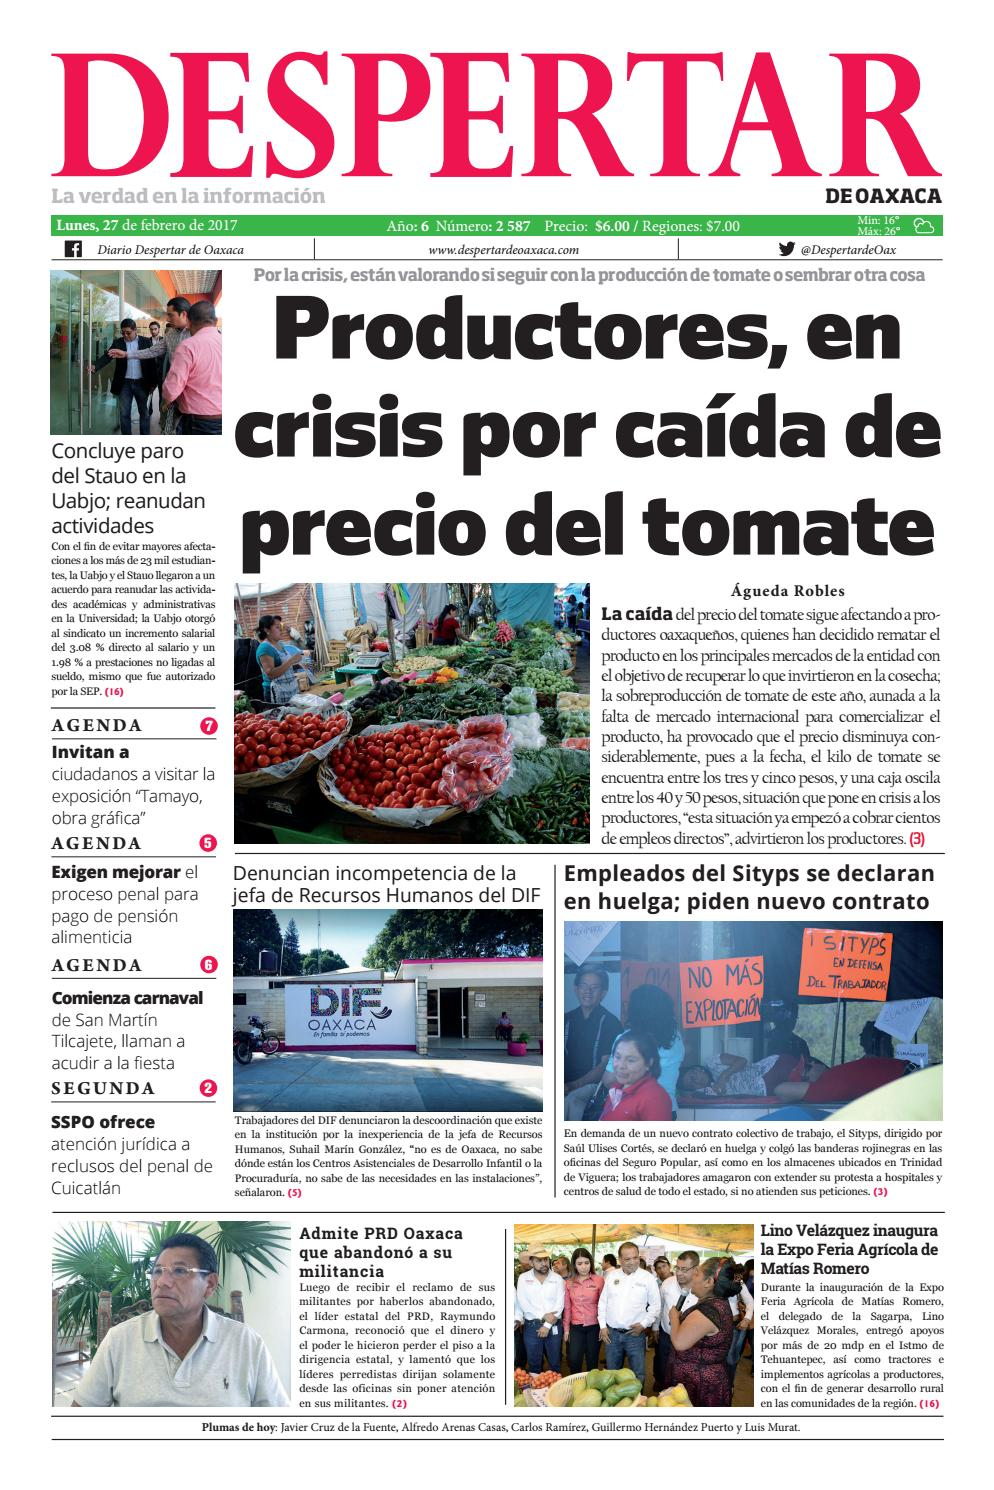 Despertar 27 de febrero 2017 by Despertar de Oaxaca - issuu